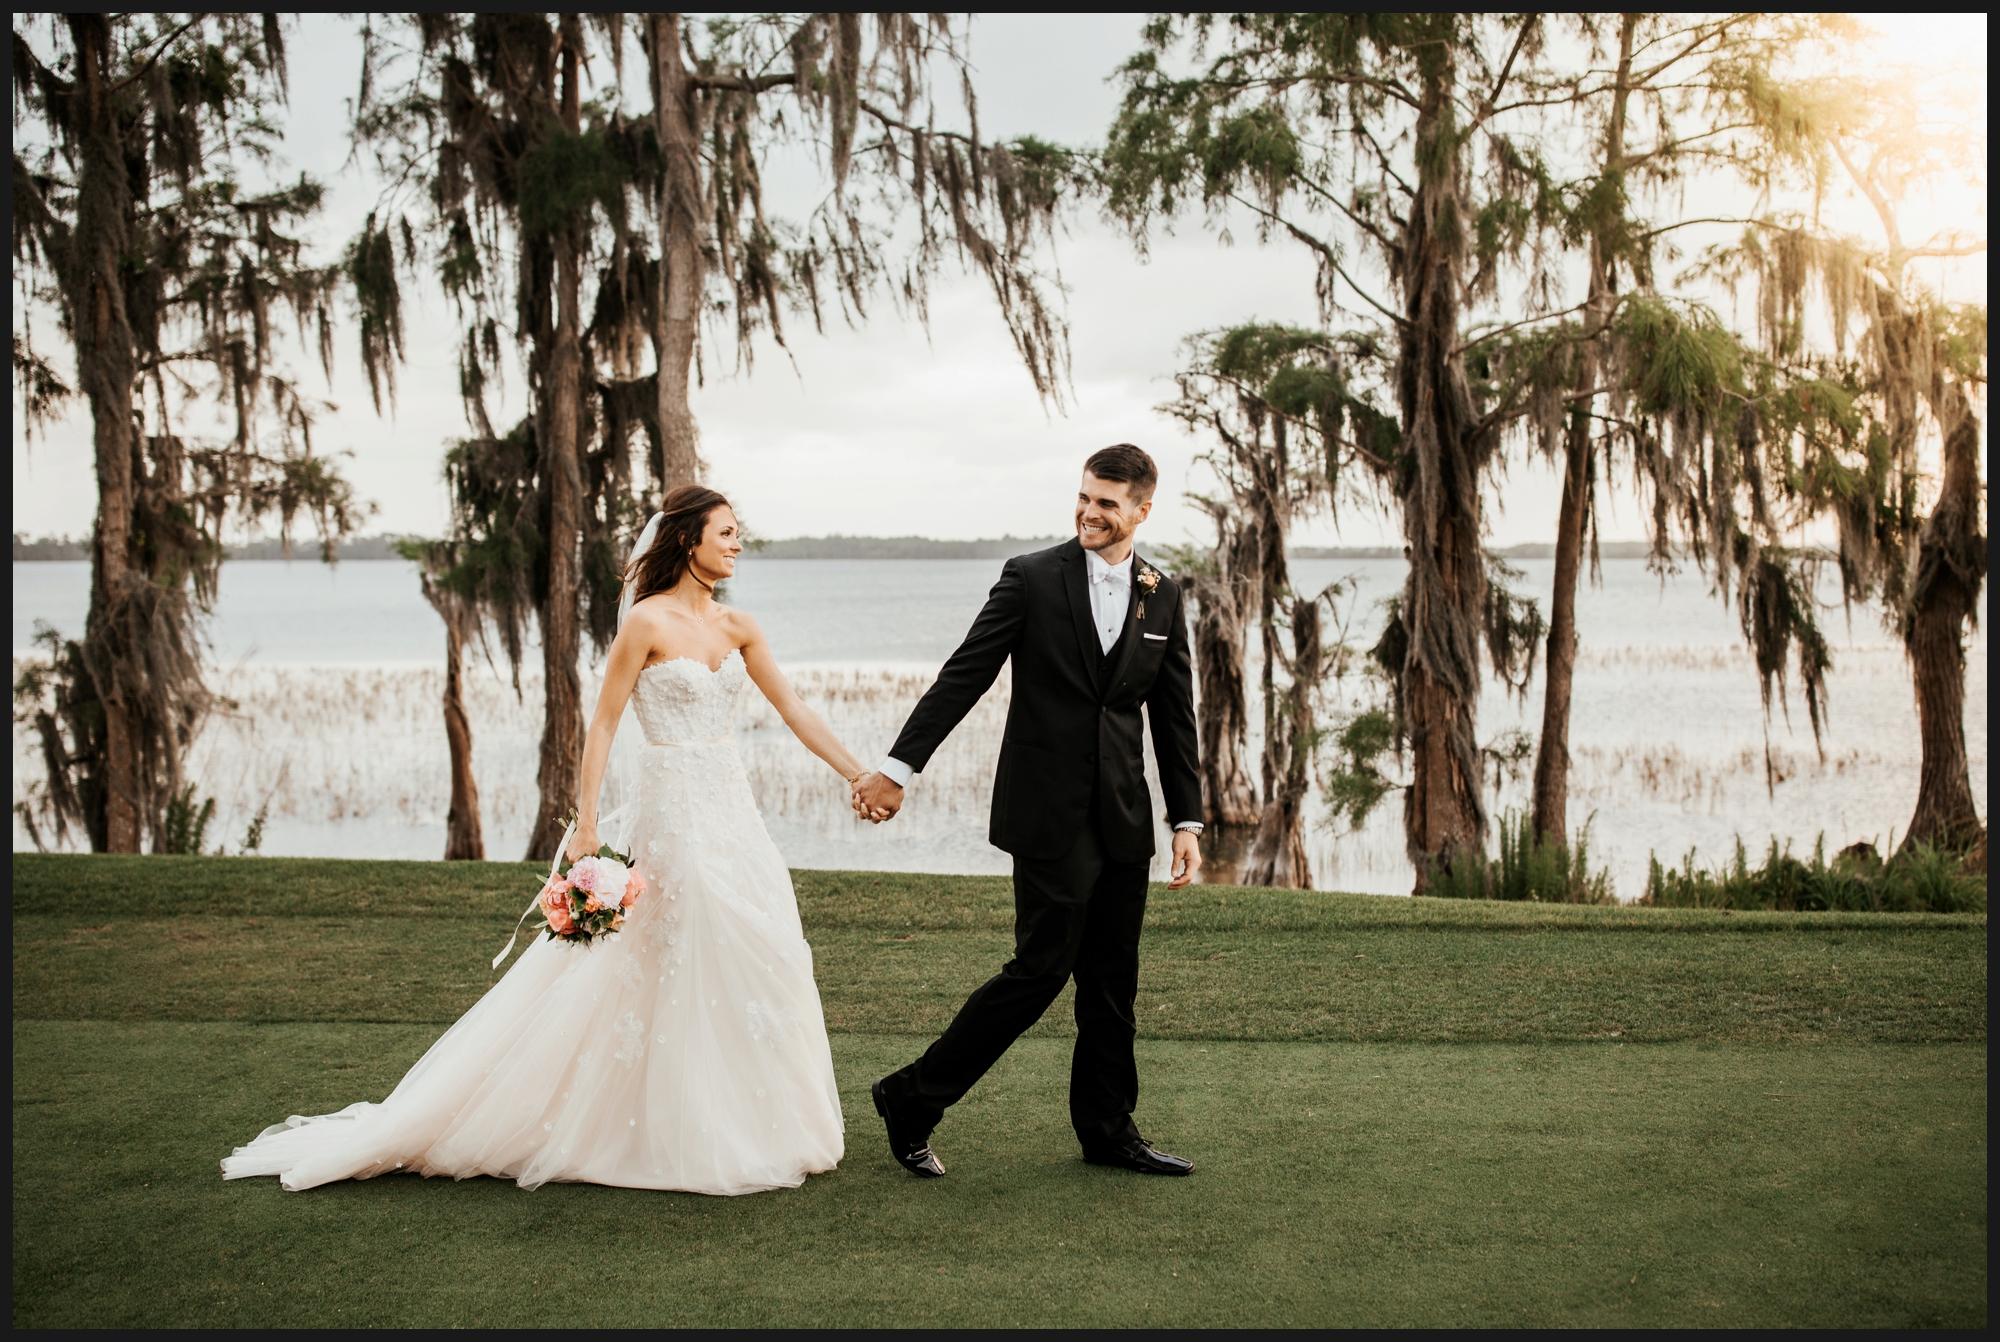 Orlando-Wedding-Photographer-destination-wedding-photographer-florida-wedding-photographer-hawaii-wedding-photographer_0239.jpg